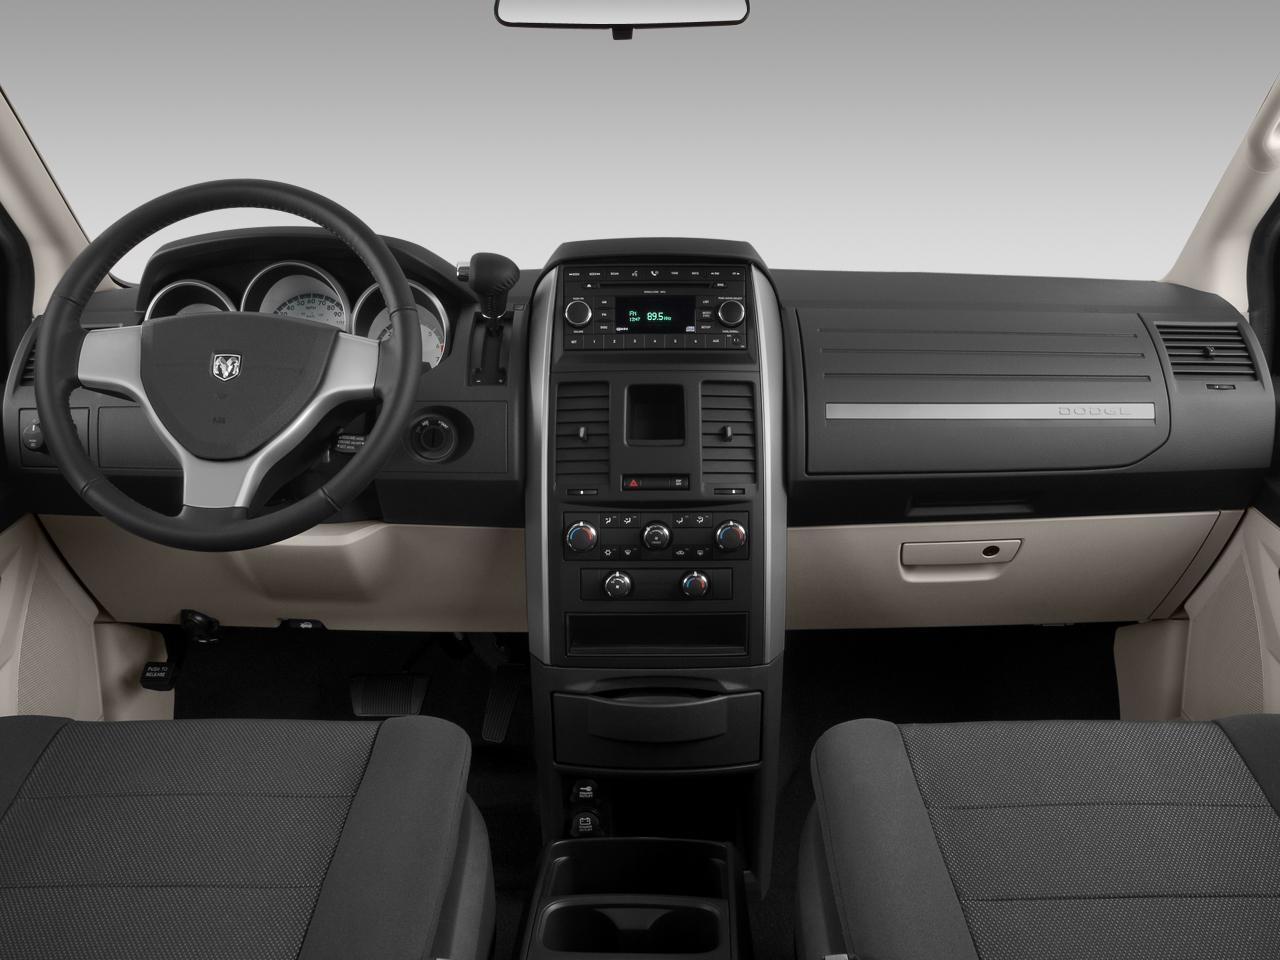 2008 Chrysler Town Amp Country Dodge Grand Caravan Recalled